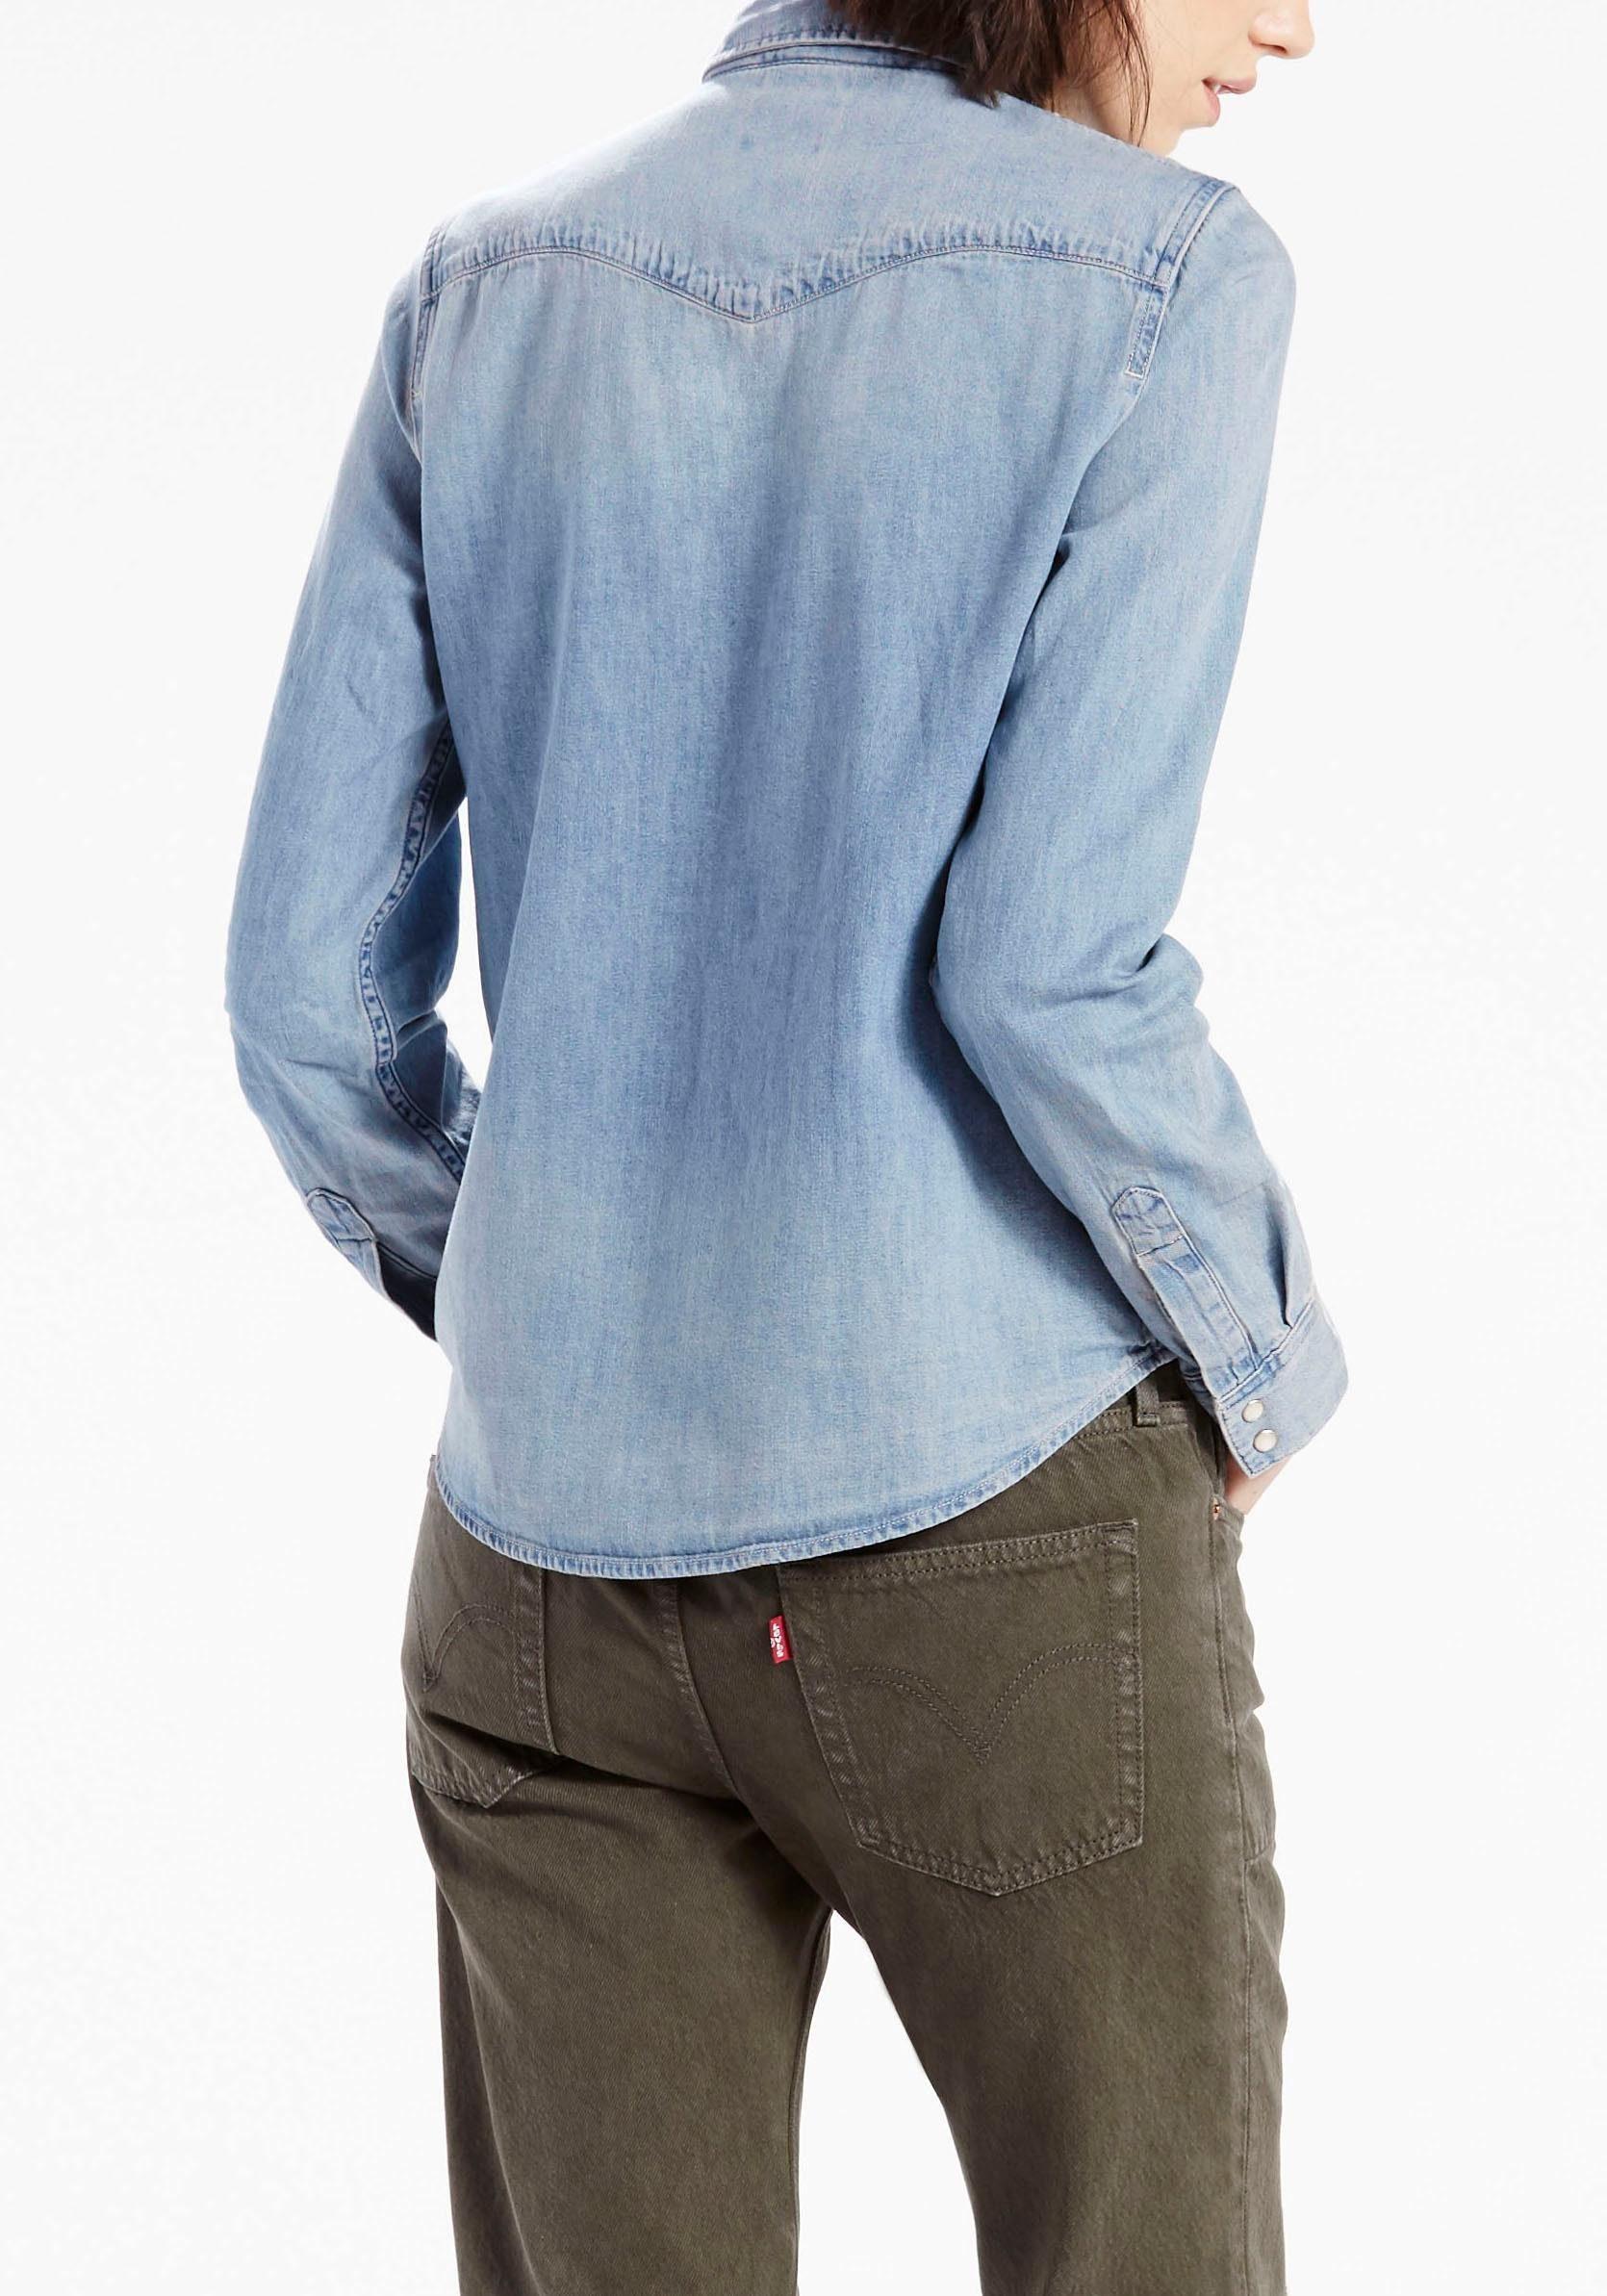 Otto jeansbluse levis minimalistischer kleiderschrank 2 for Minimalistischer kleiderschrank